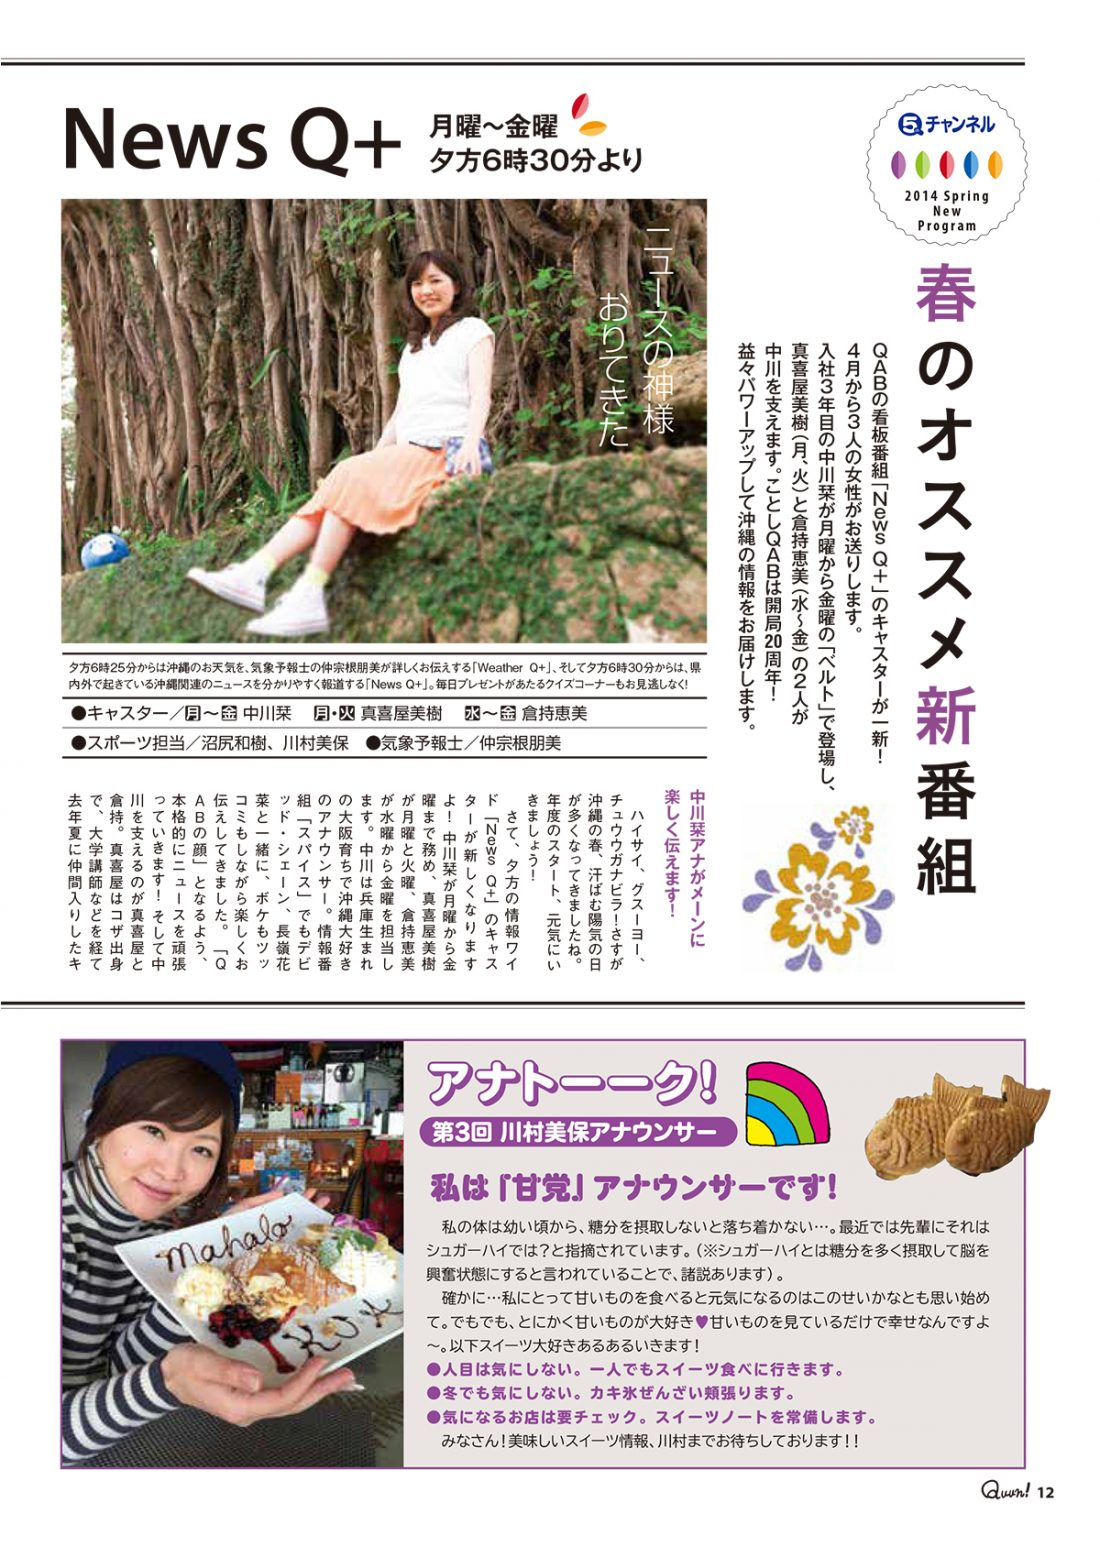 https://www.qab.co.jp/qgoro/wp-content/uploads/quun_0314-1100x1558.jpg